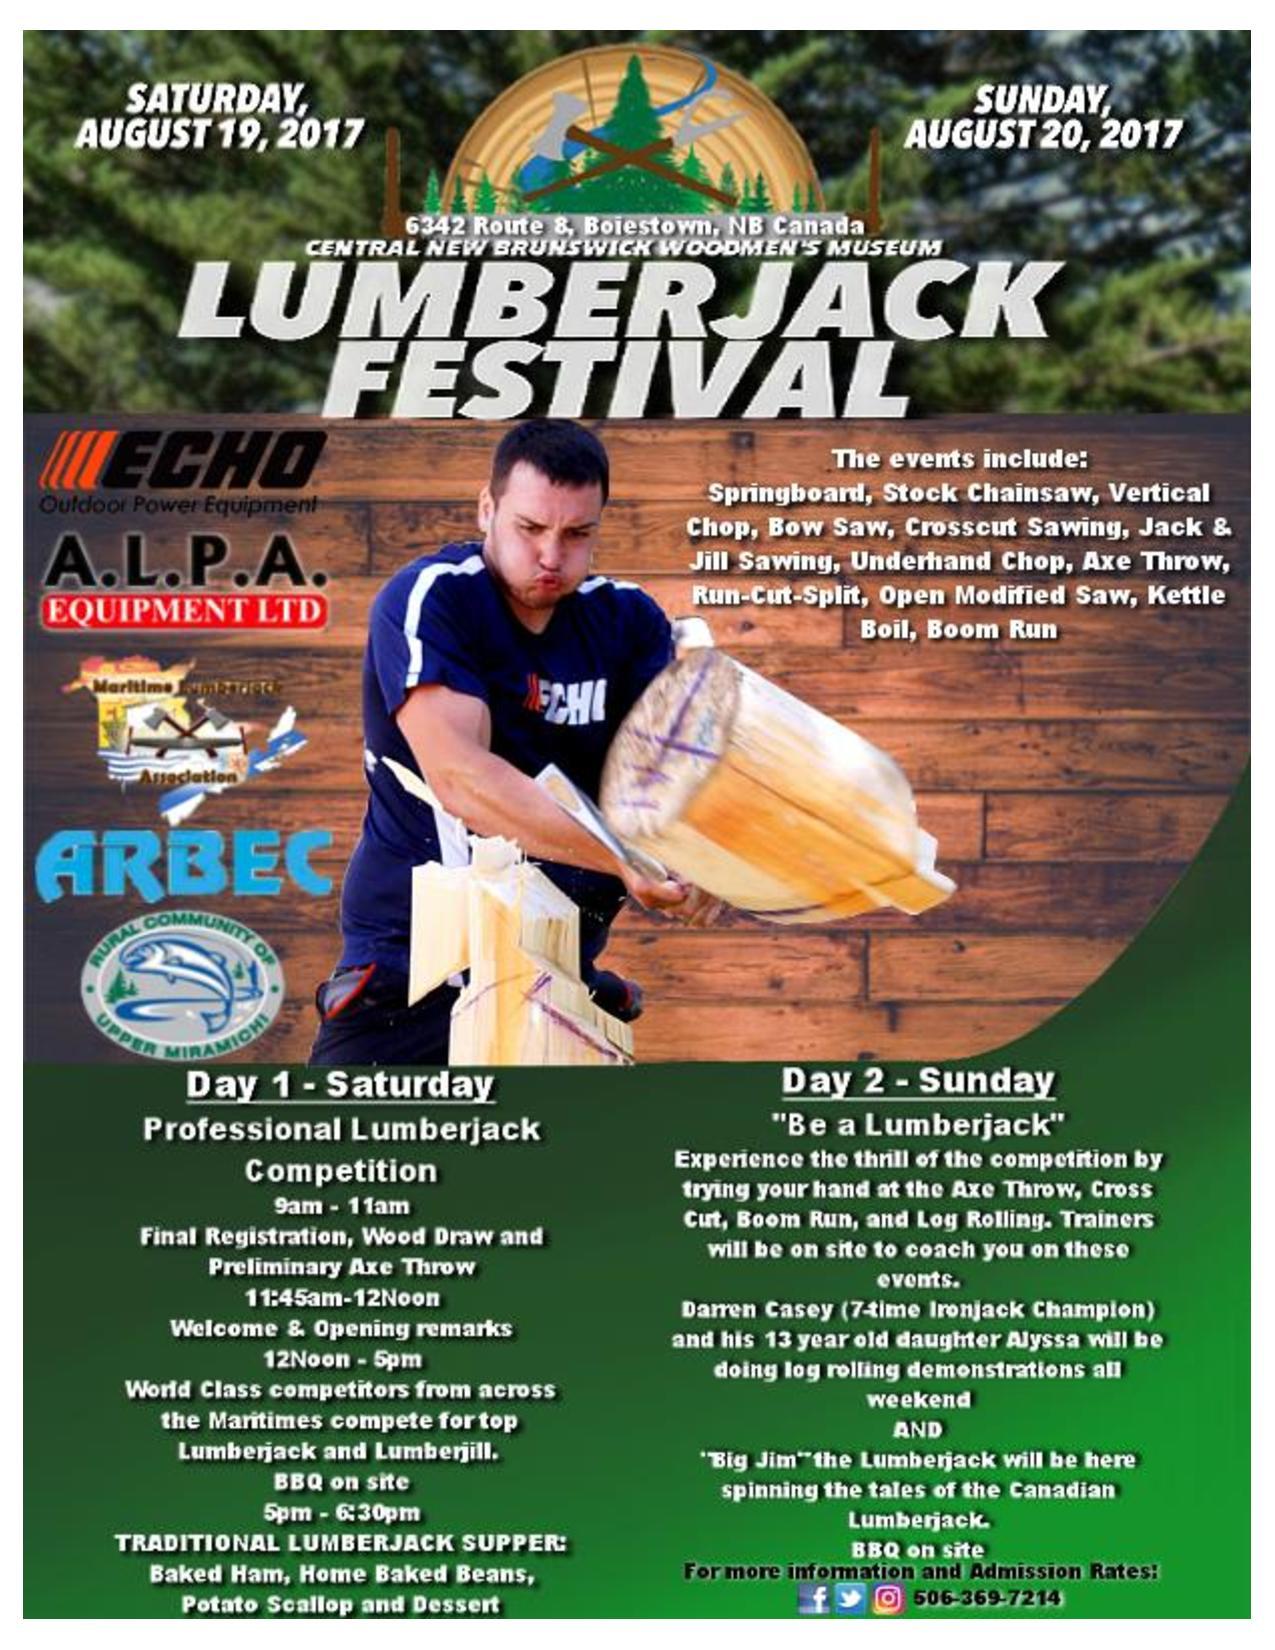 Lumberjacks are Gathering in Boiestown for Lumberjack Festival at the Woodmen's Museum